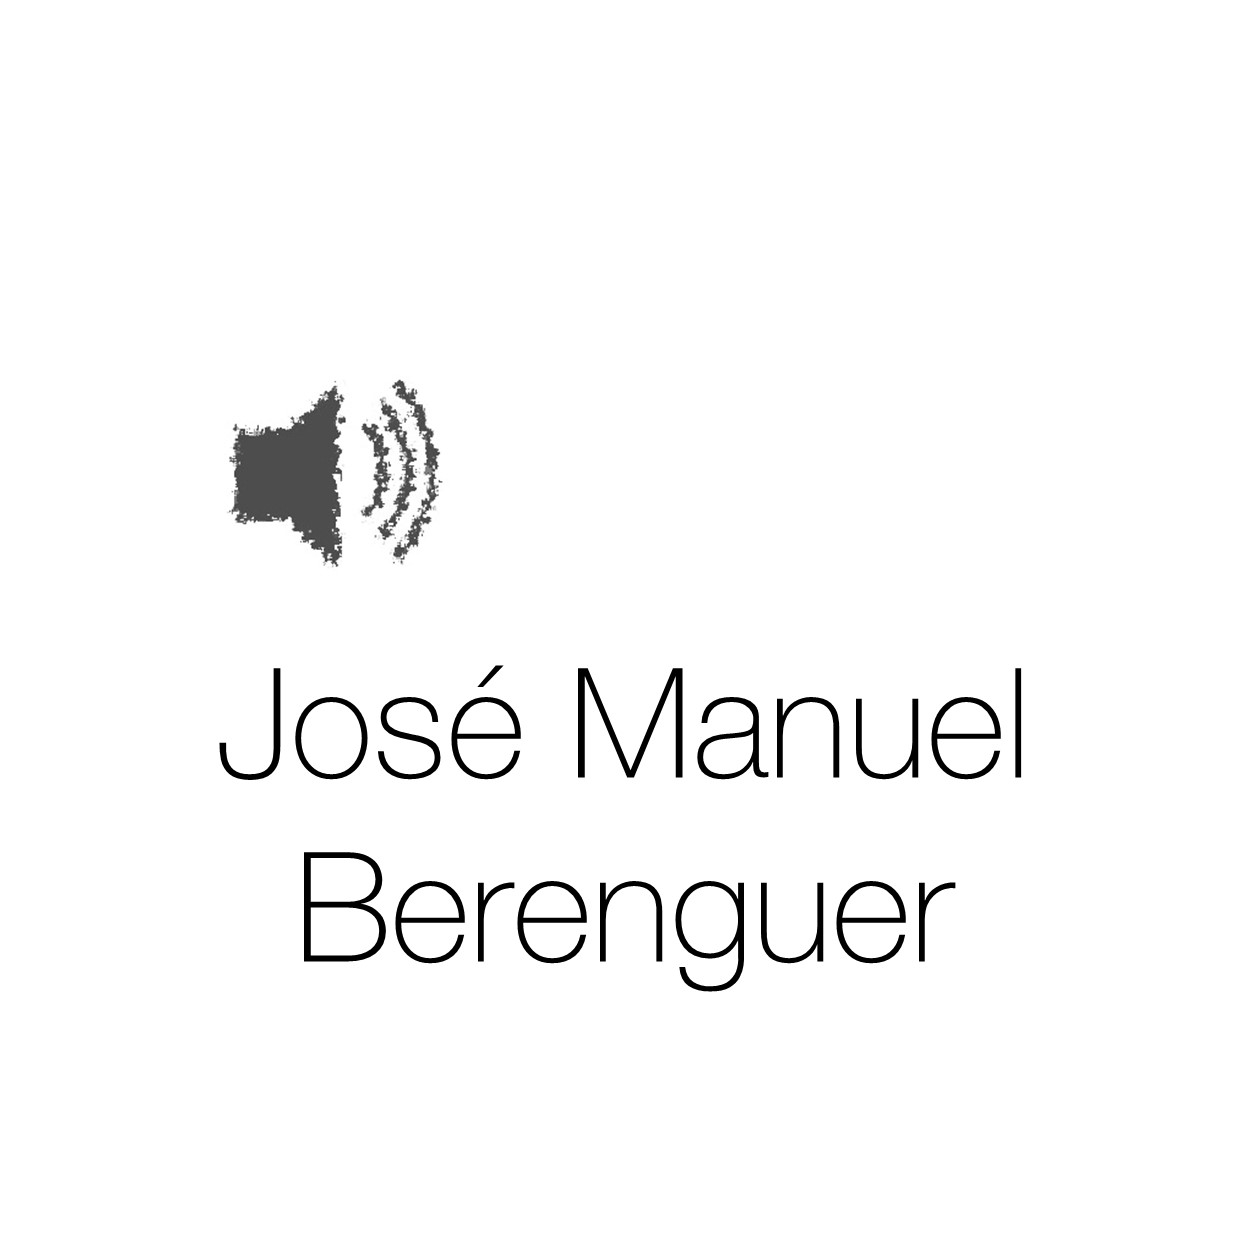 Piedra Bugre (2020) - José Manuel Berenguer